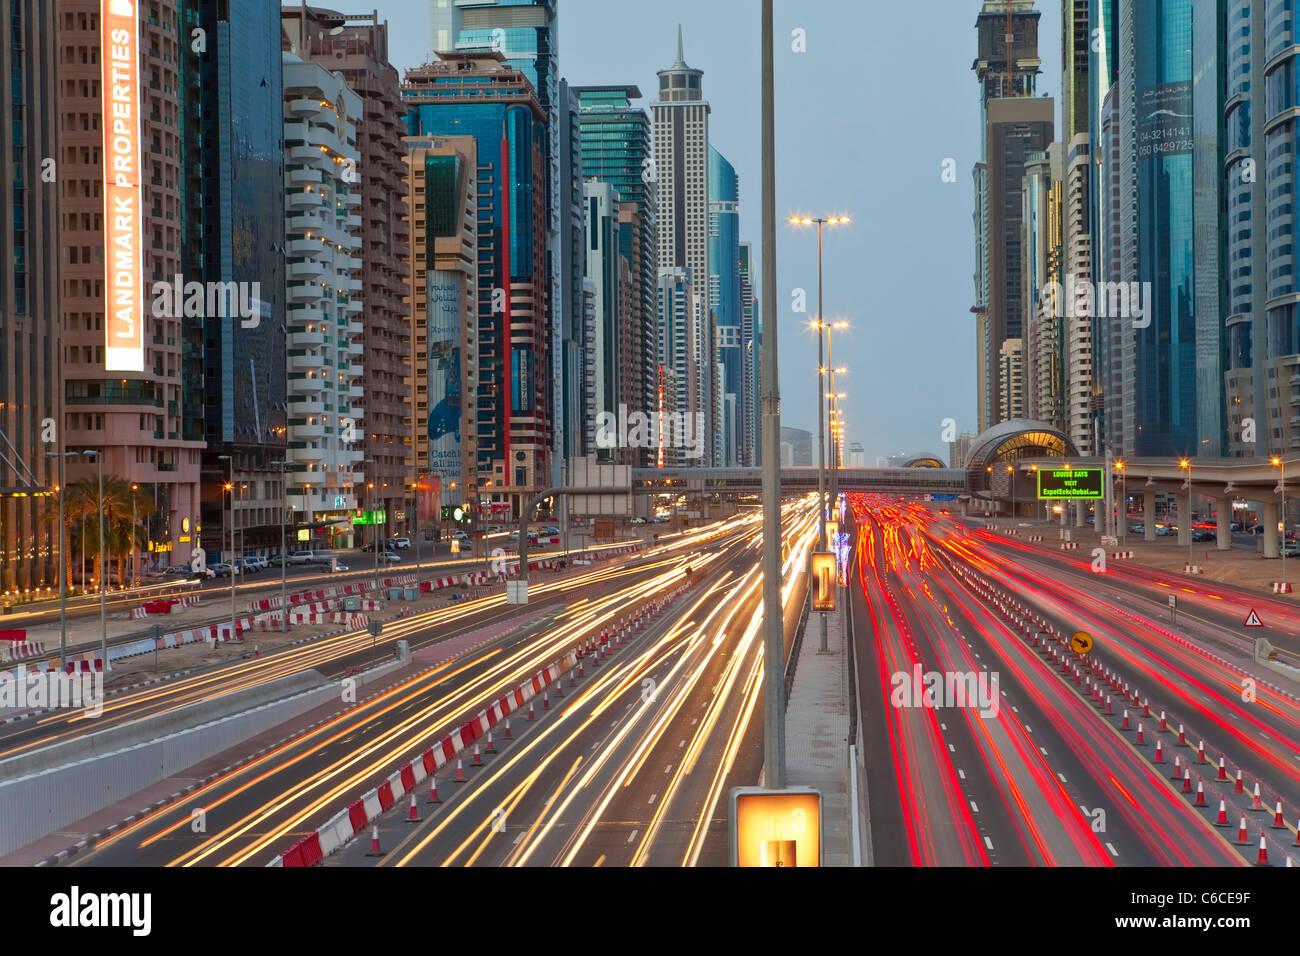 United Arab Emirates, Dubai, Sheikh Zayed Road, traffic and new high rise buildings along Dubai's main road - Stock Image